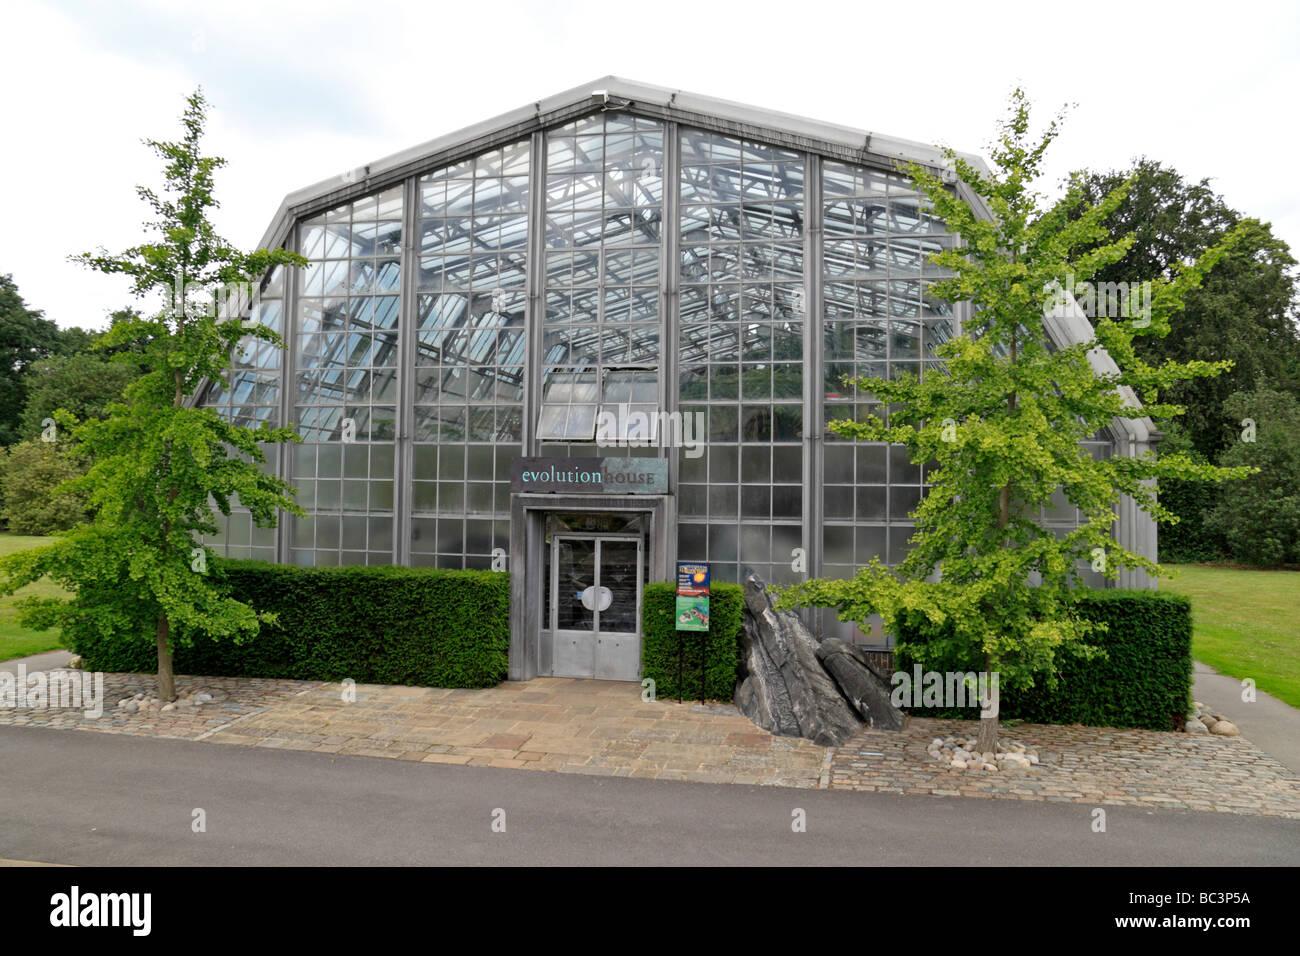 External view of Evolution House, The Royal Botanic Gardens, Kew, Surrey, England. - Stock Image